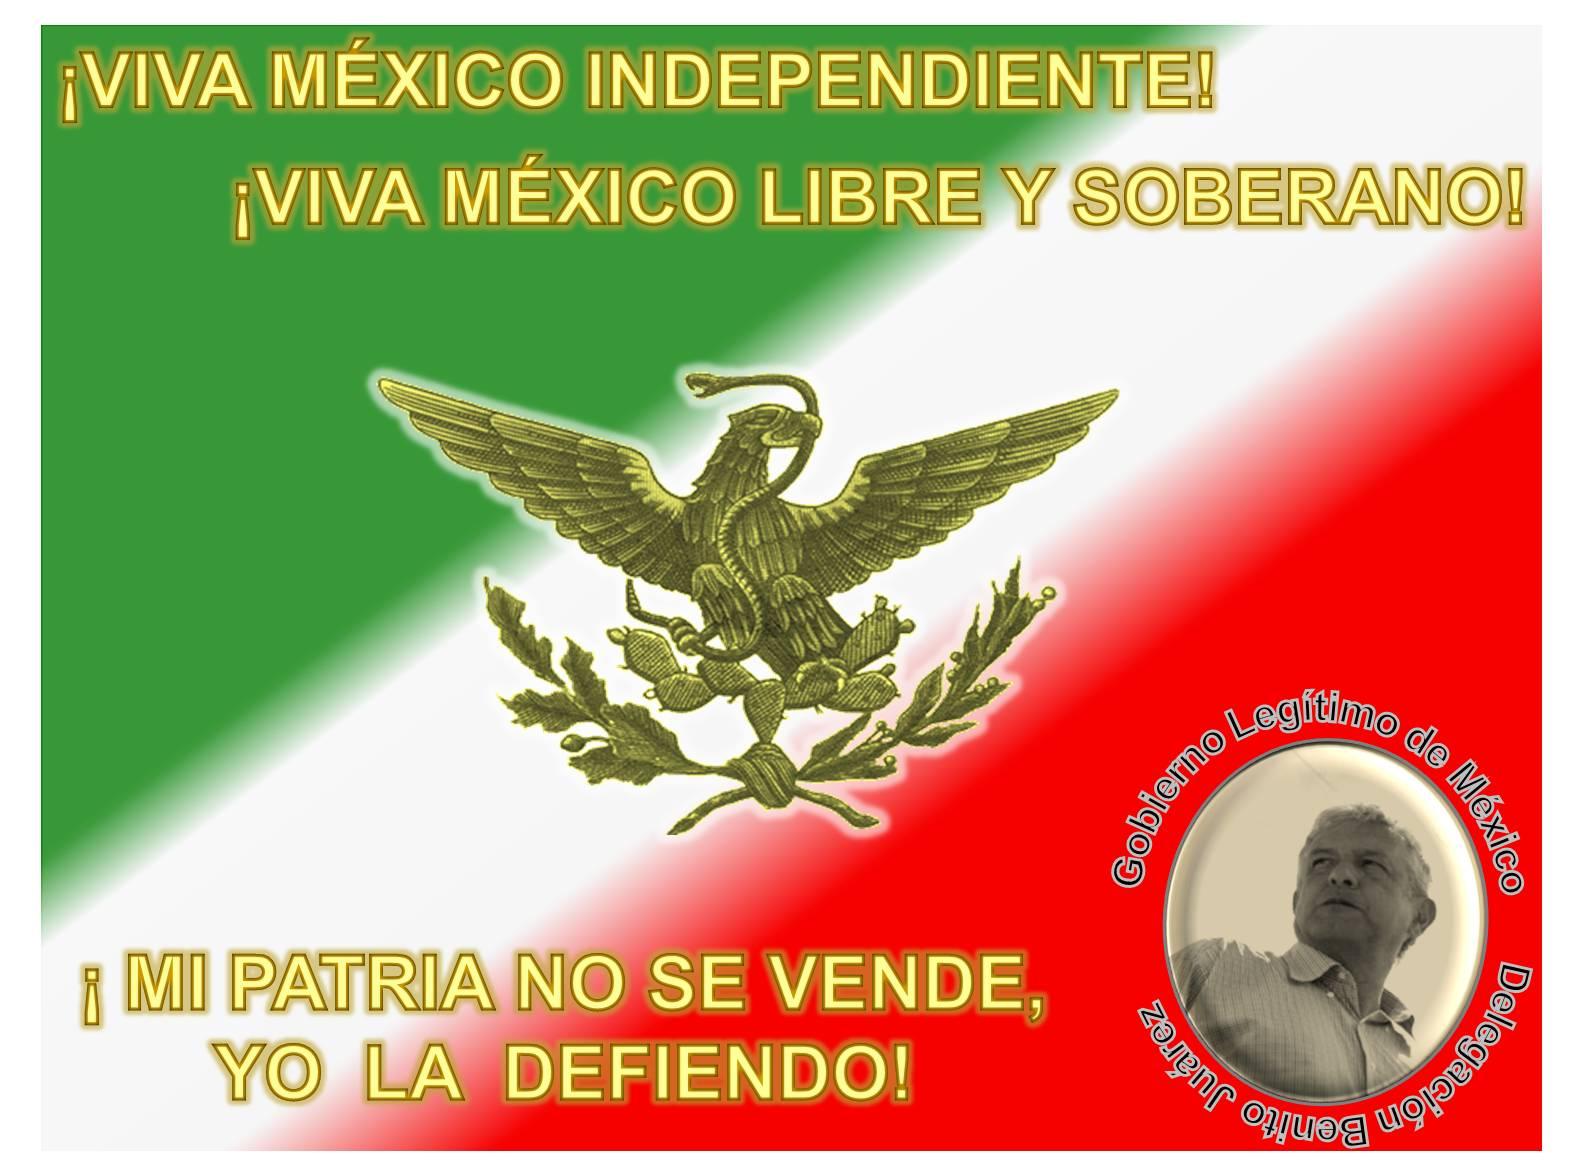 http://4.bp.blogspot.com/_12Mn4XuA1H0/SMg4lCDtomI/AAAAAAAAAIU/PJSndJaDE0A/S1600-R/VIVA+MEXICO.jpg